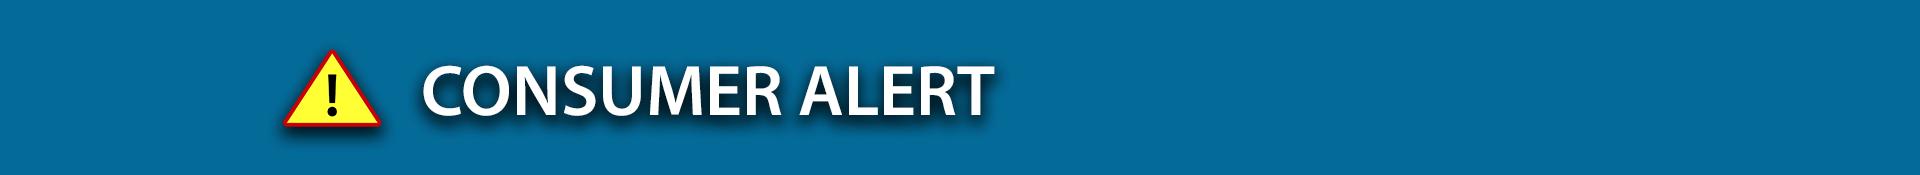 Consumer alert logo